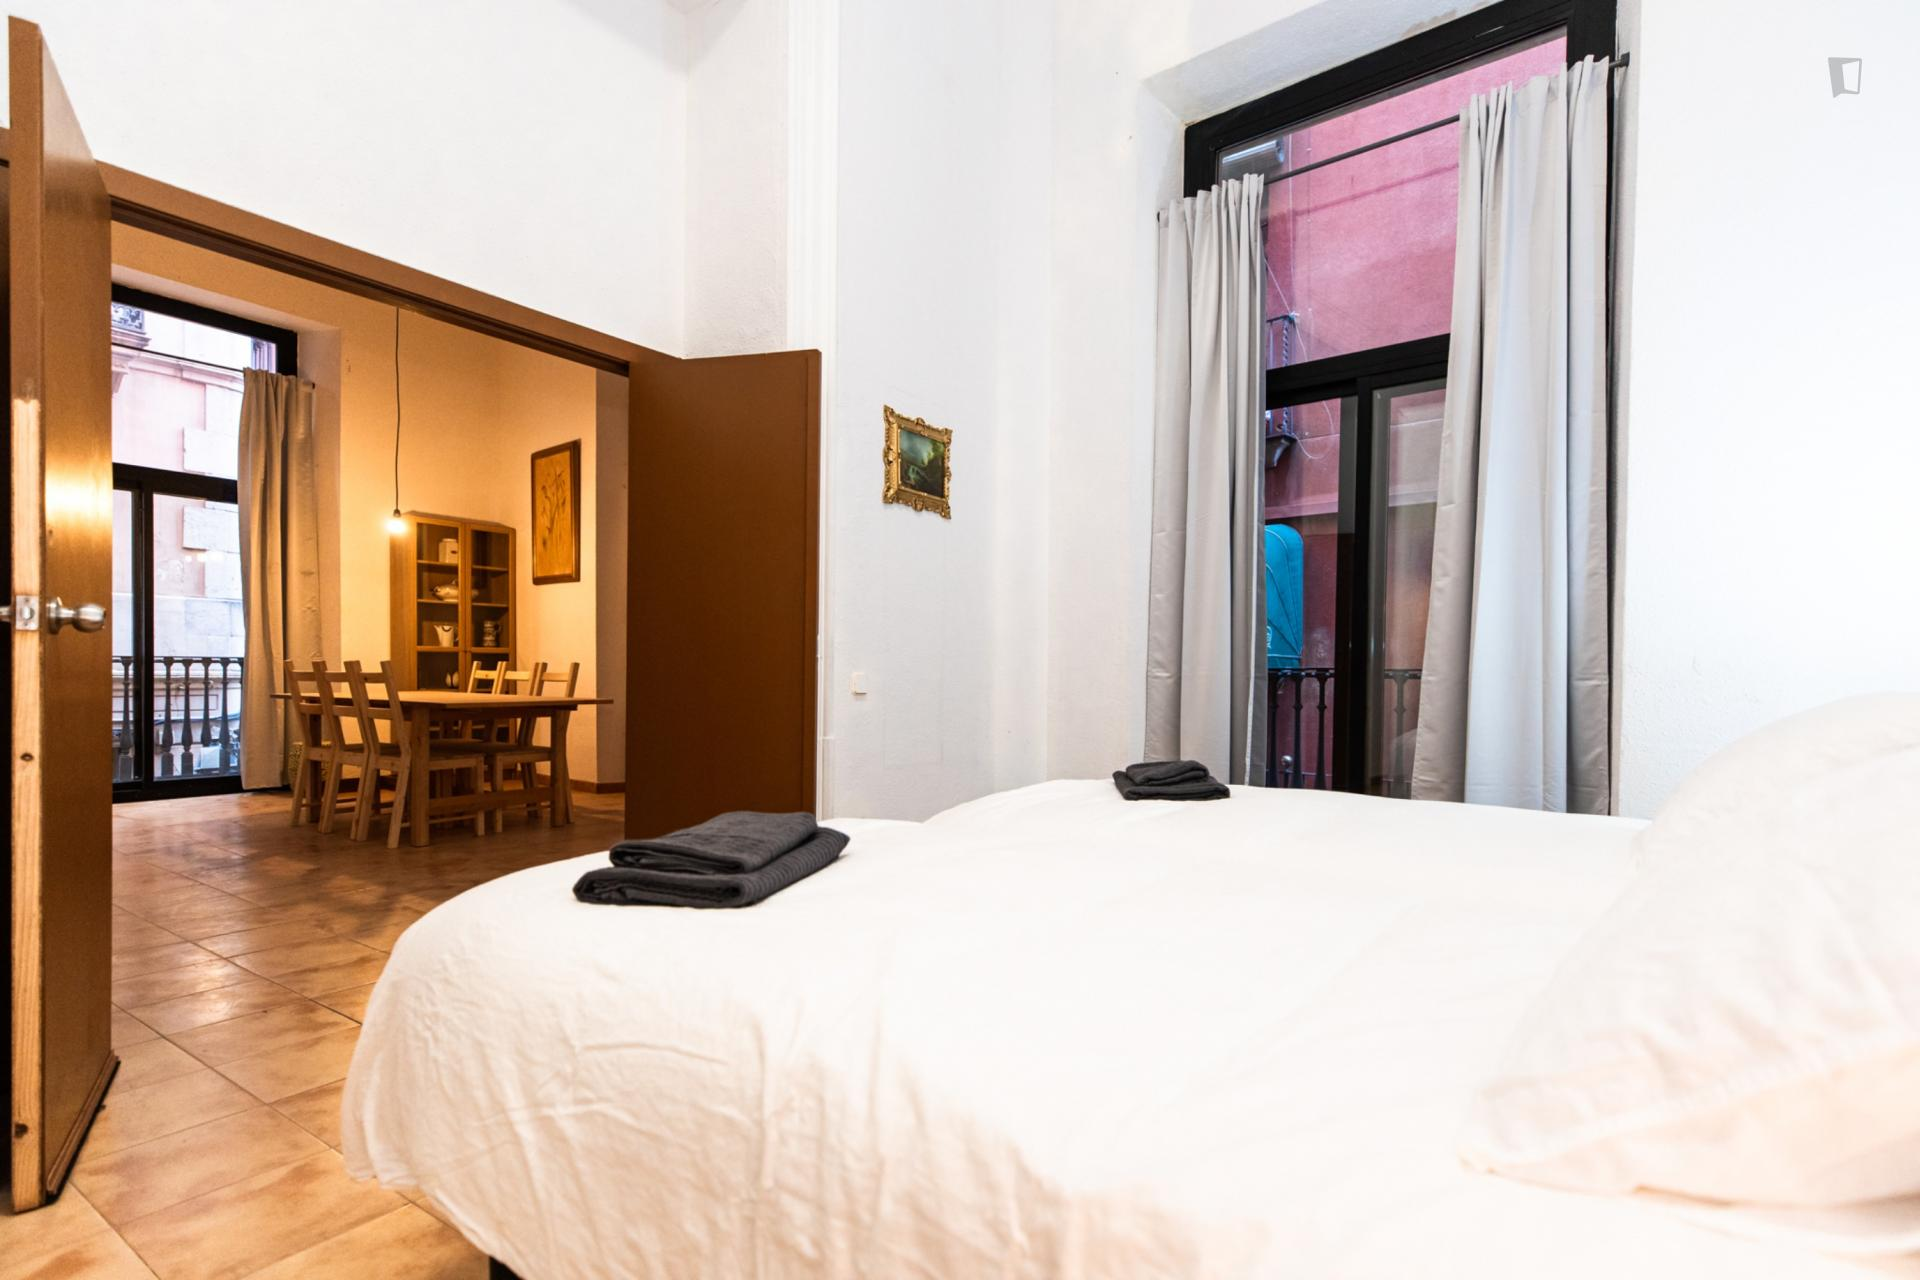 Fransesc - Entry ready flat in Barcelona